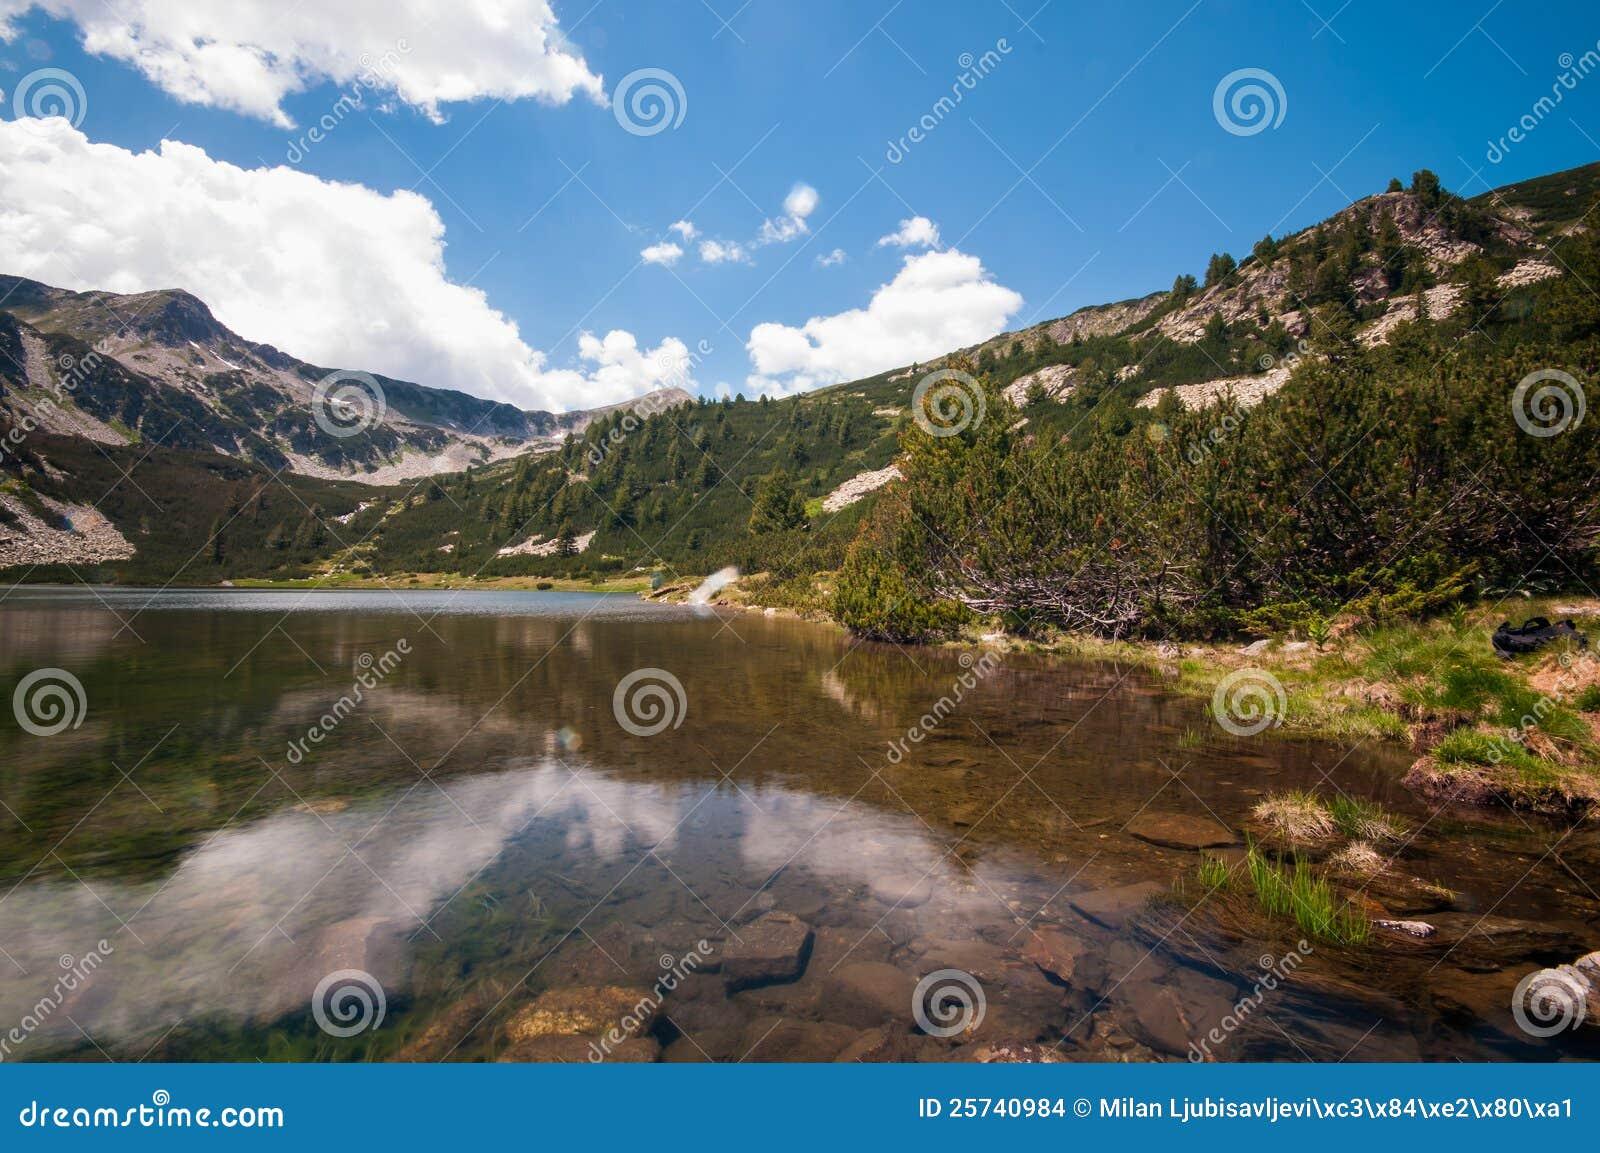 Mountain Lake and Blue Sky